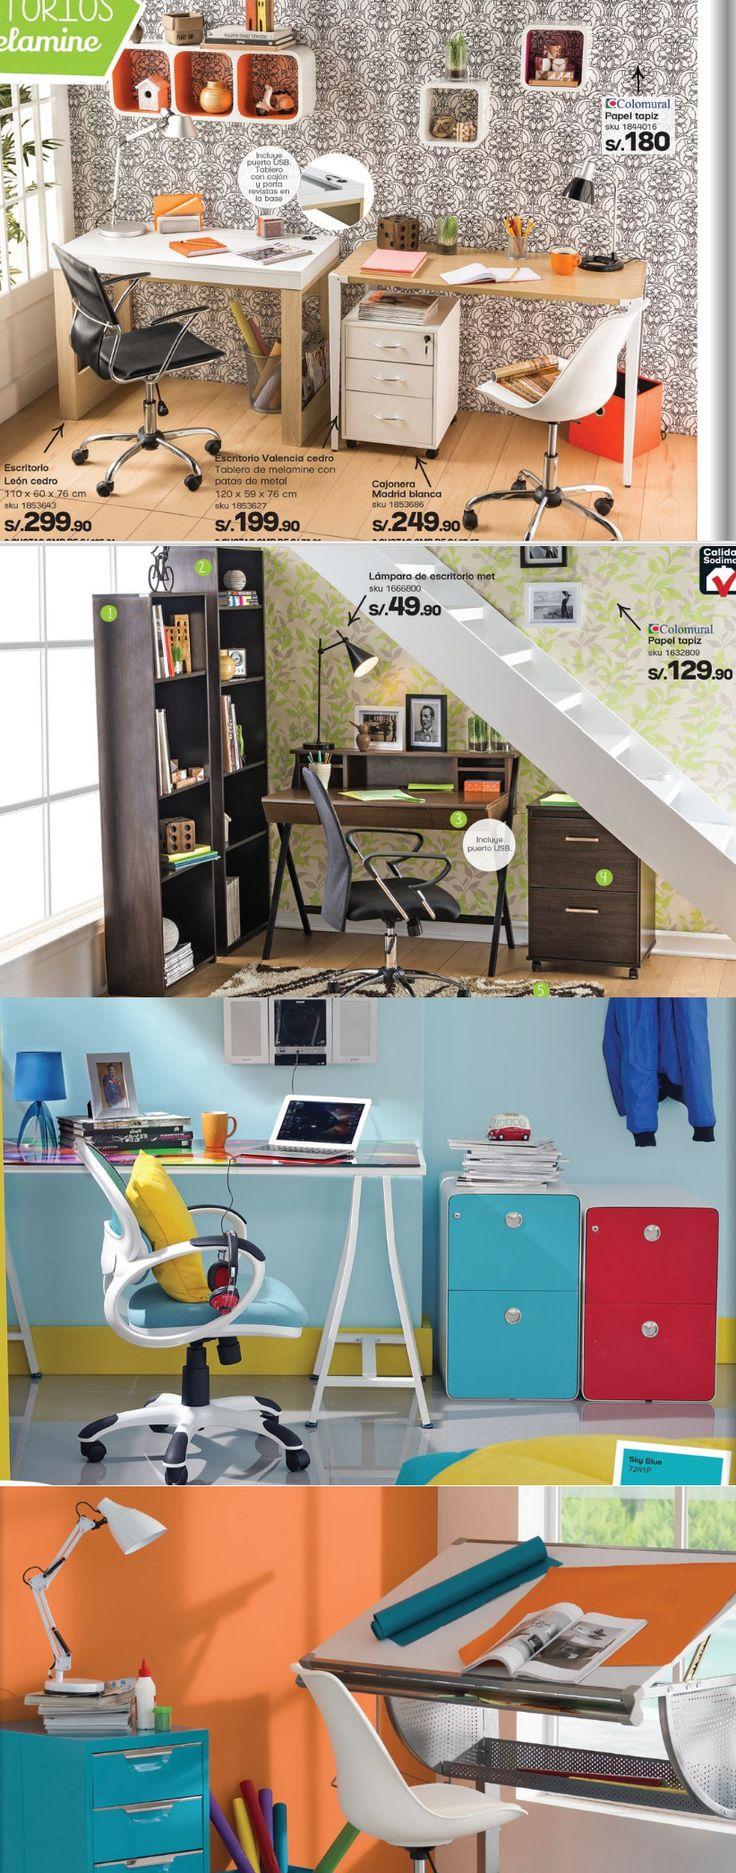 http://www.sodimac.com.pe/static/CatalogoWeb/catalogo.html?asset=SodimacPeru/Home-Marzo-2014